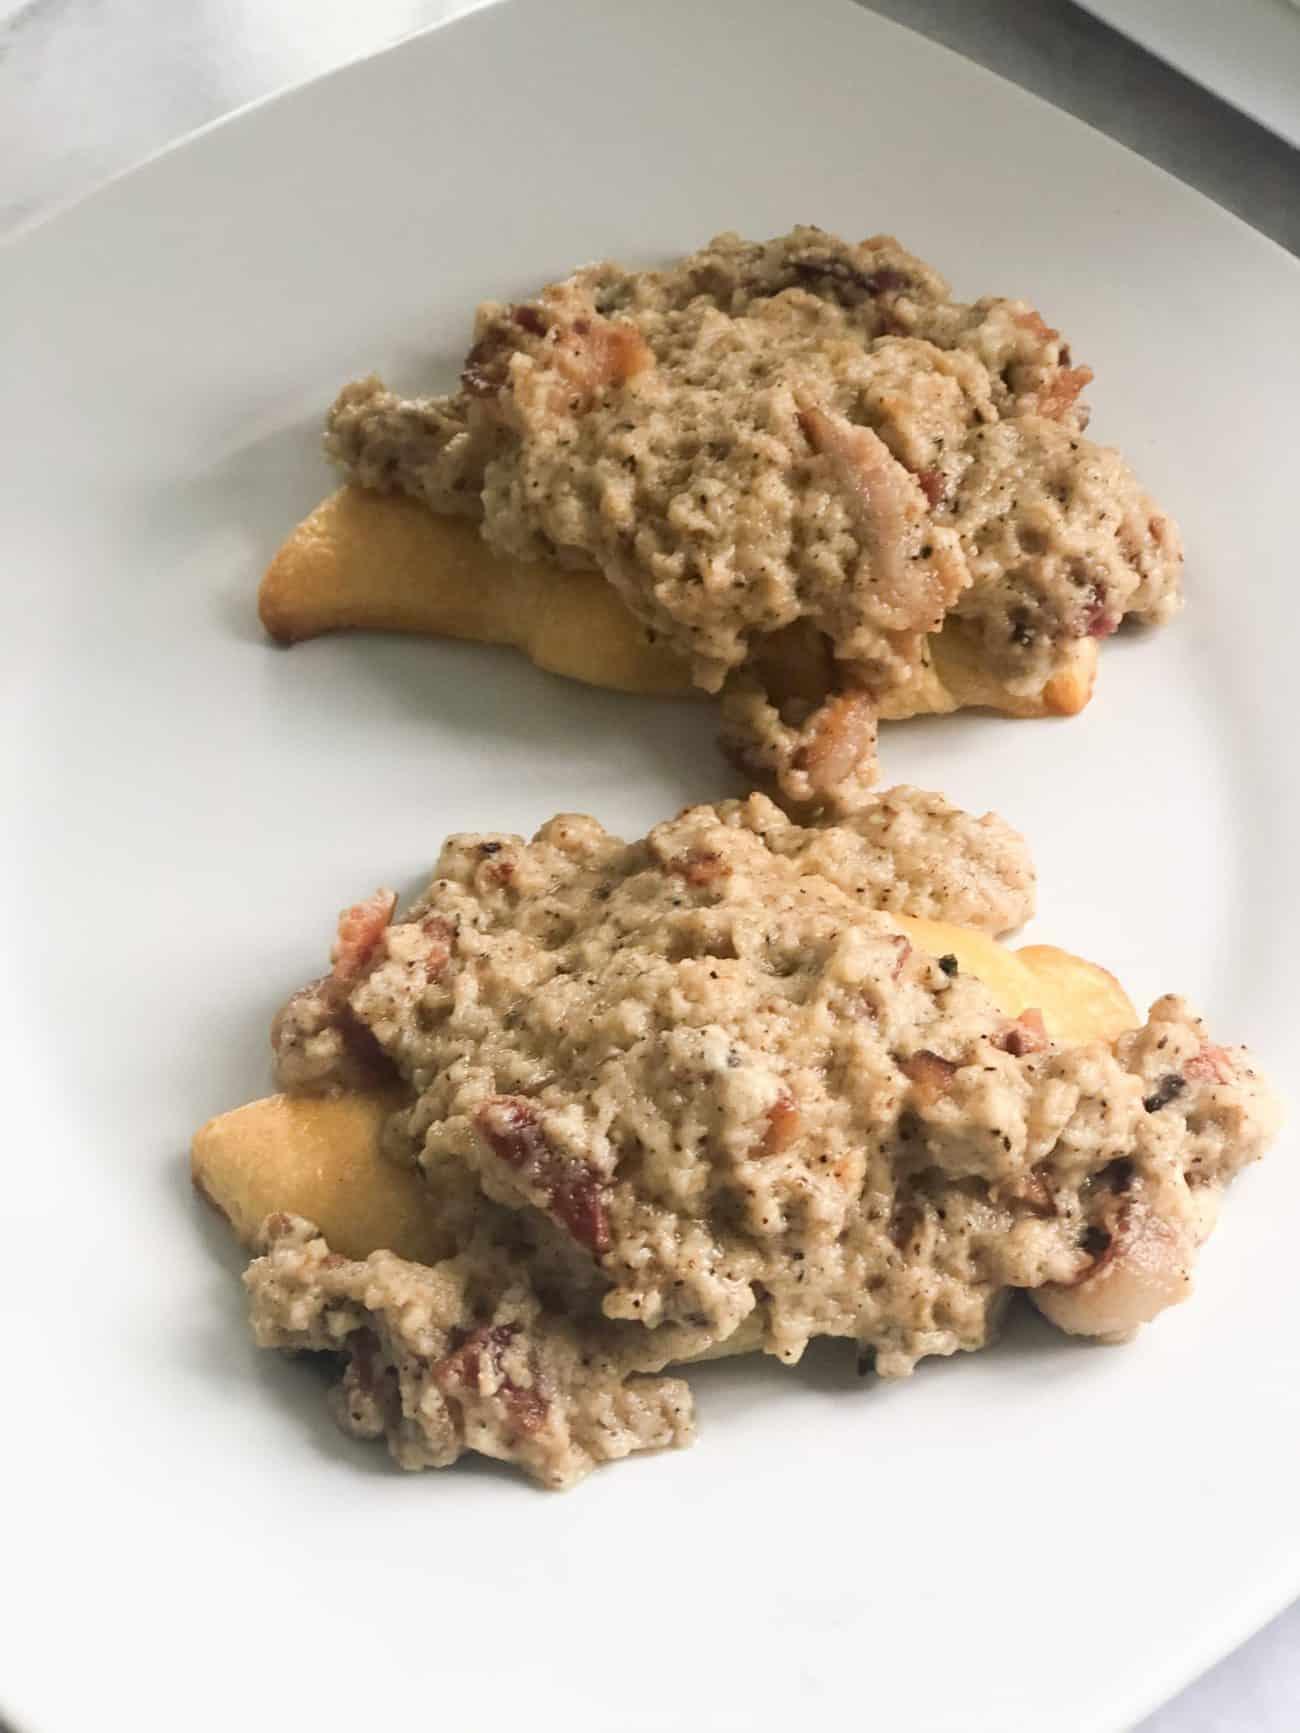 The Best Bacon Gravy for Croissants